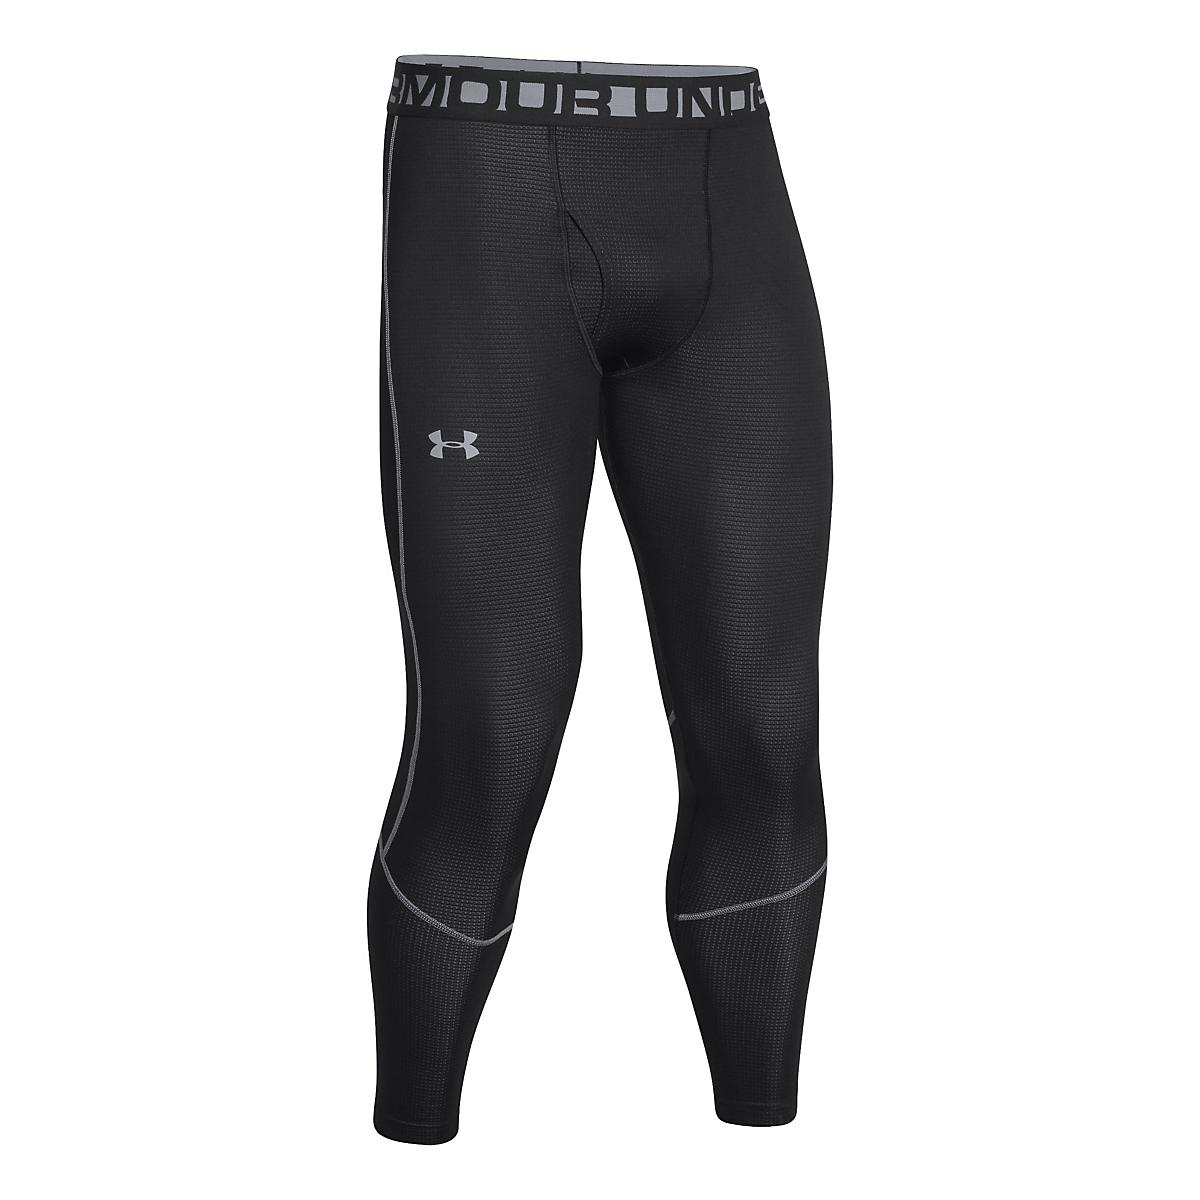 Men's Under Armour�ColdGear Infrared Grid Legging